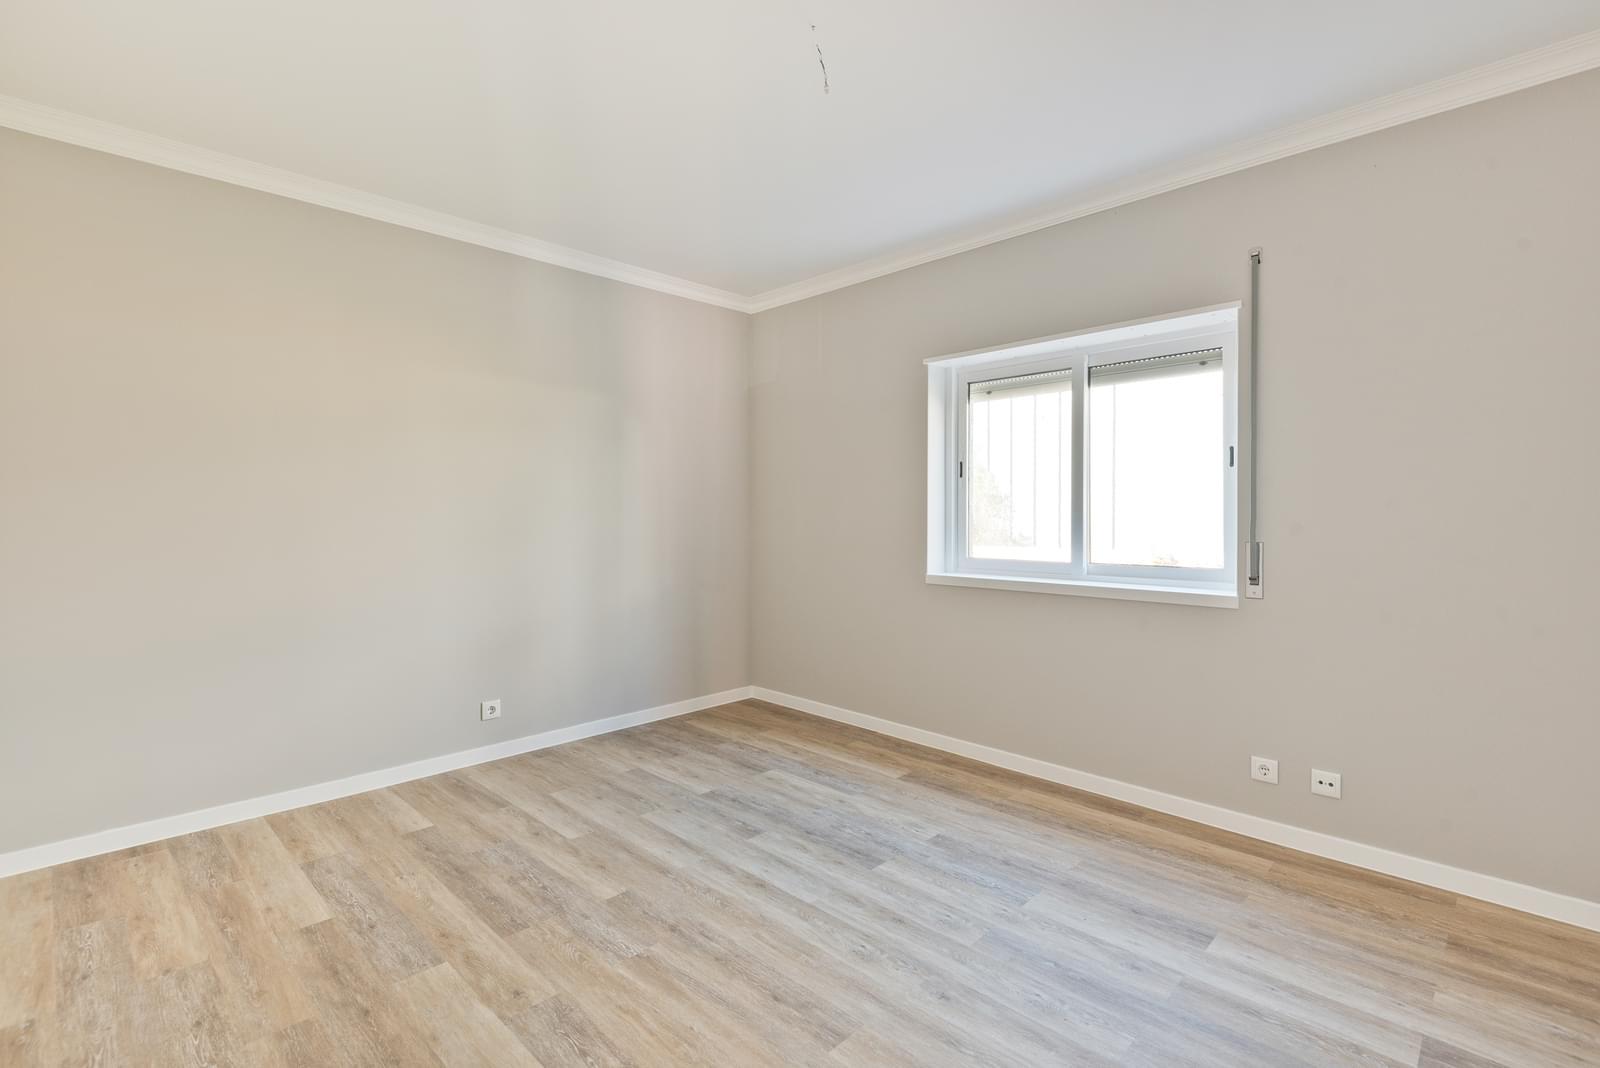 pf18907-apartamento-t2-cascais-3c3ad4c4-51b3-452f-911b-d2cc1f1c9126